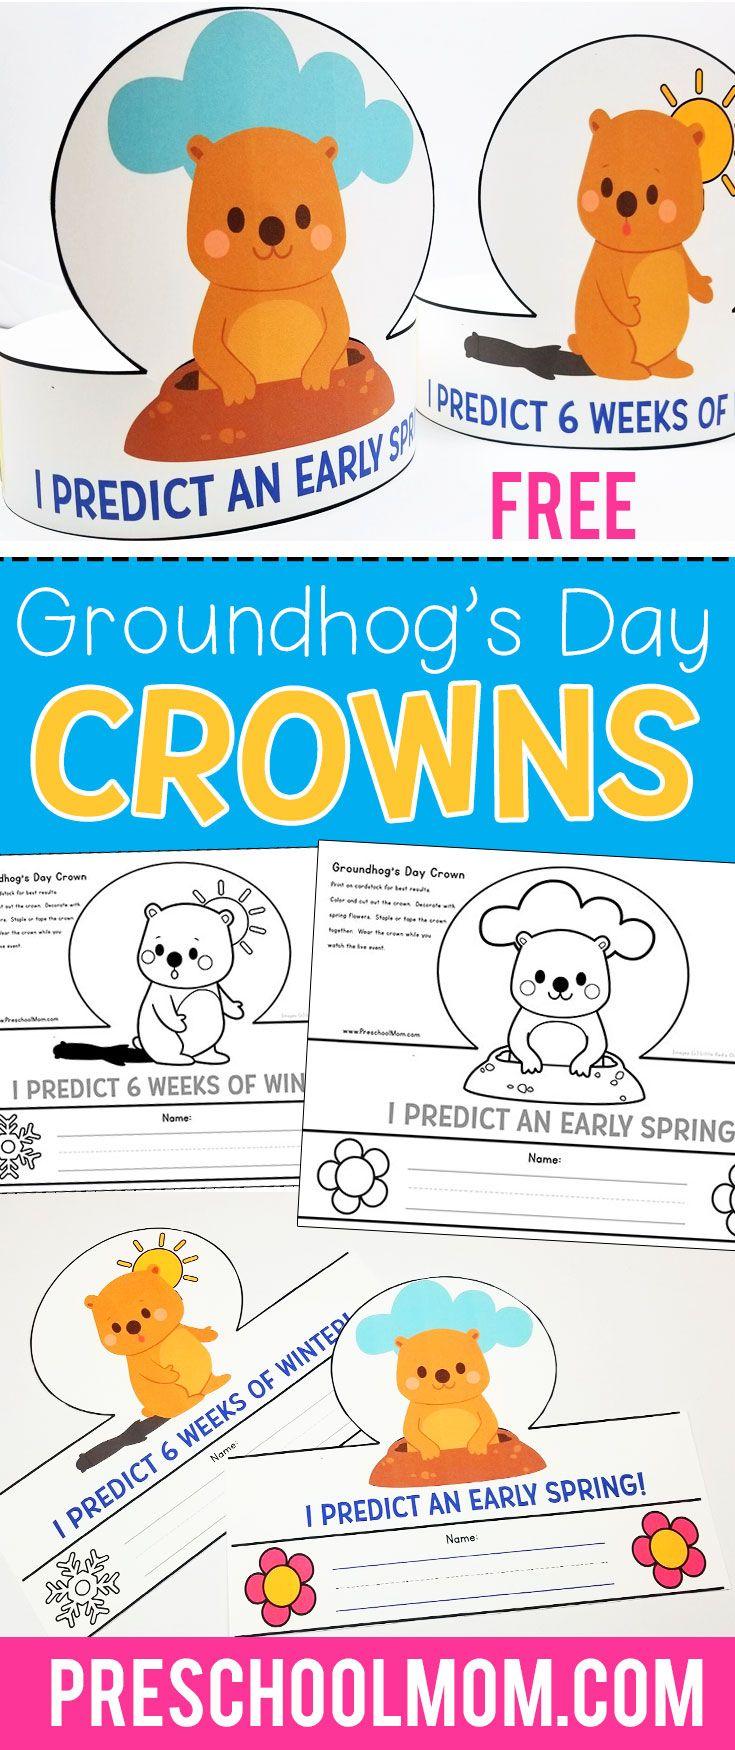 {pinterest1 Groundhog's Day Preschool Printables https://preschoolmom.com/preschool-printables/groundhogs-day-preschool-printables/?utm_campaign=coschedule&utm_source=pinterest&utm_medium=Valerie&utm_content=Groundhog%27s%20Day%20Preschool%20Printables}